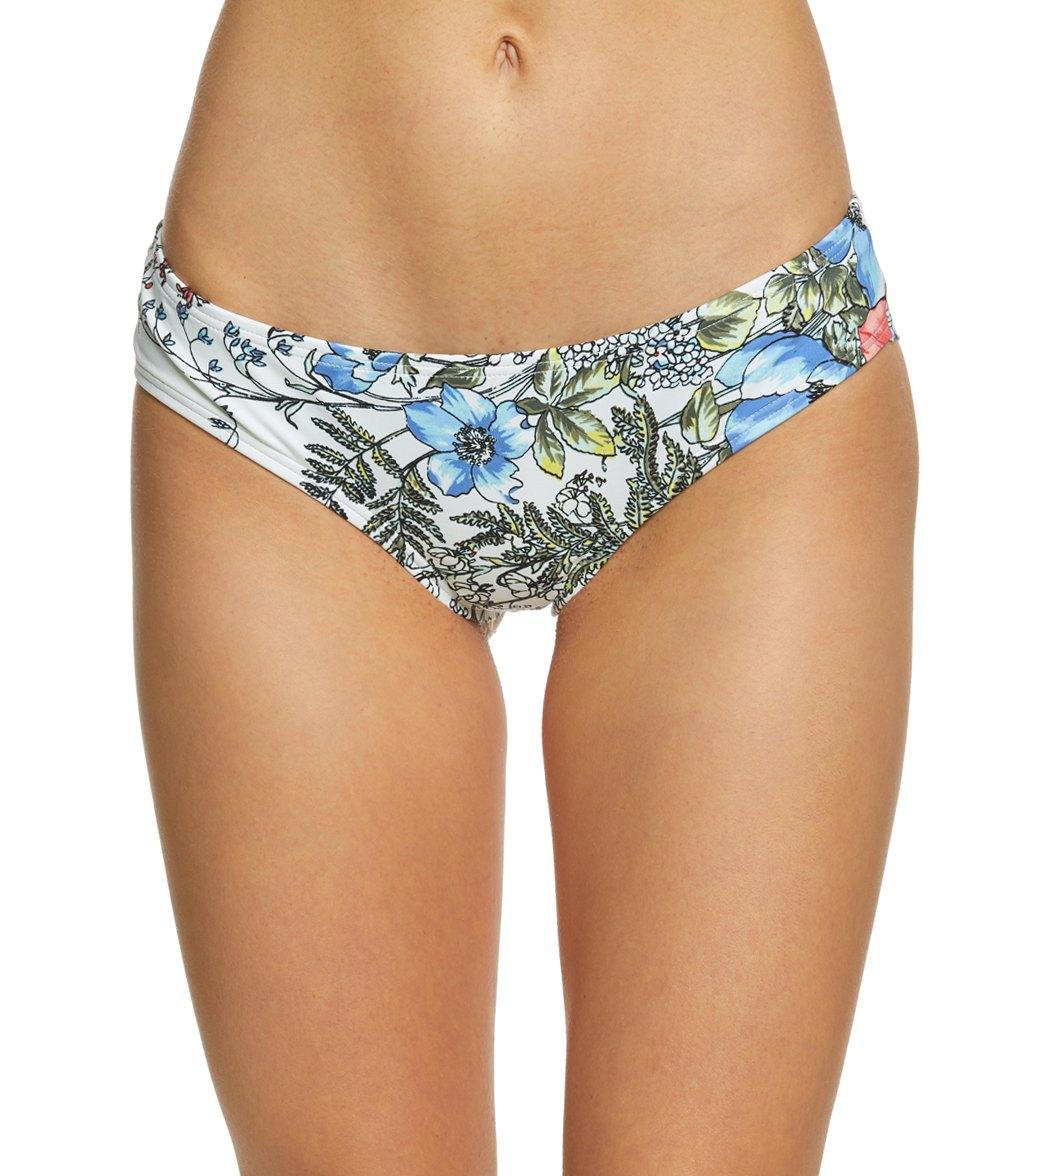 Vince Camuto Women One-Piece Swimsuit Shirred Smooth Cheeky Bikini Bottoms